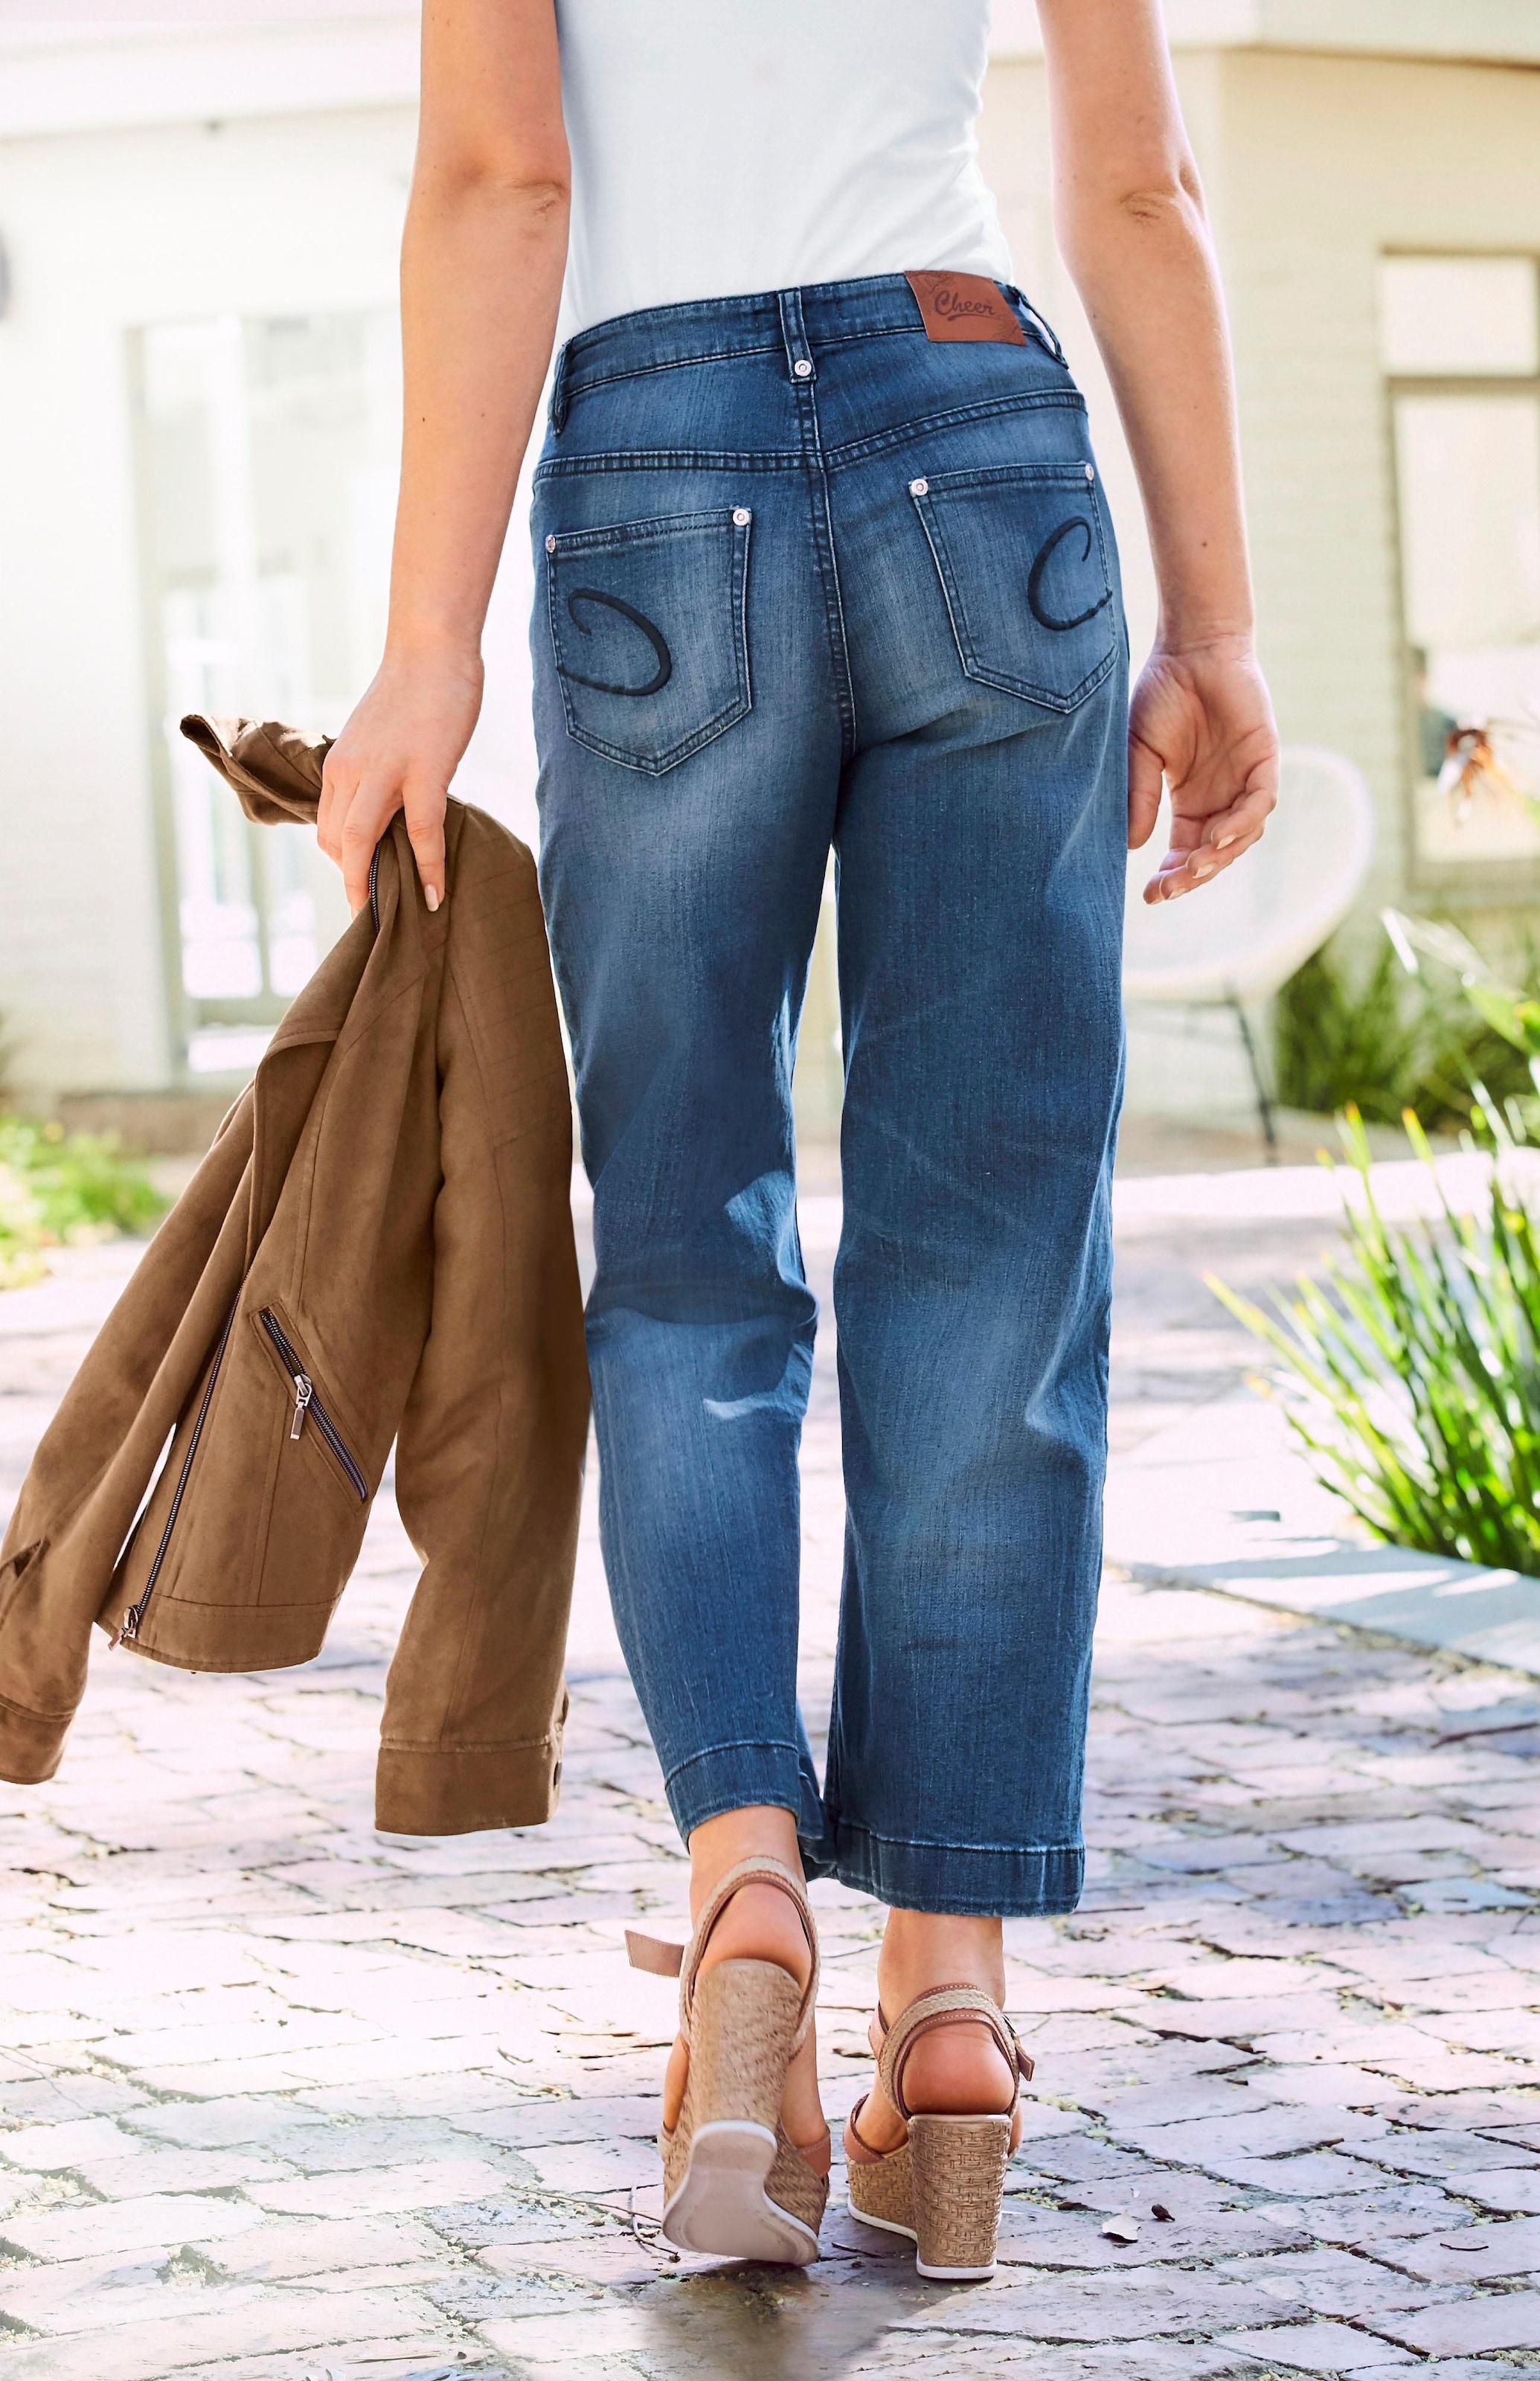 Aniston 5 Pocket Jeans Damen Jeans Damen Kleidung Rabatte